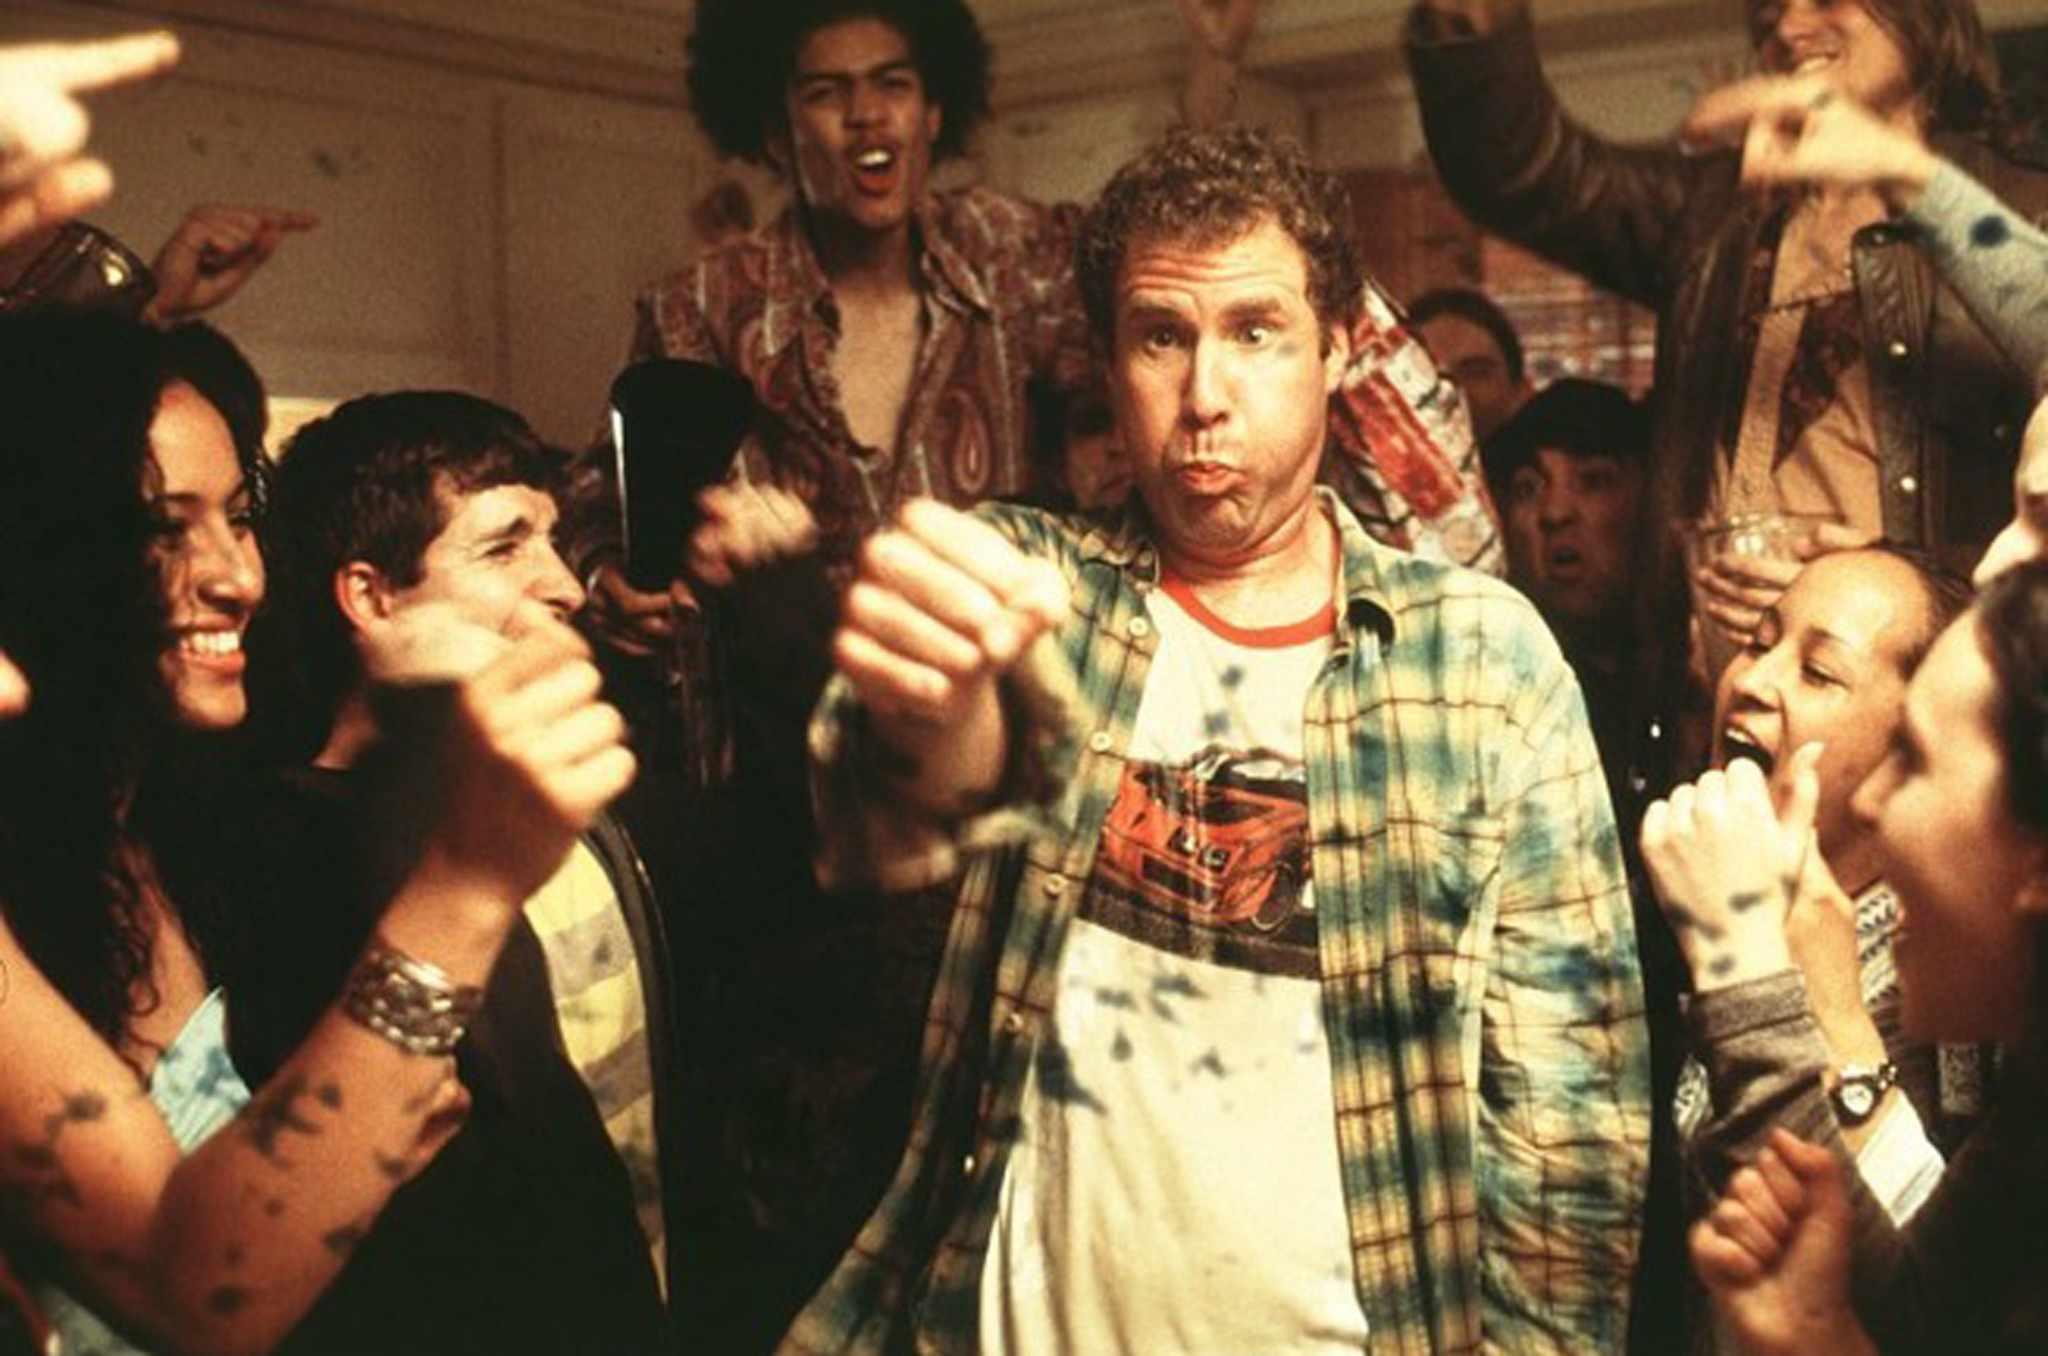 Will Ferrell in Old School